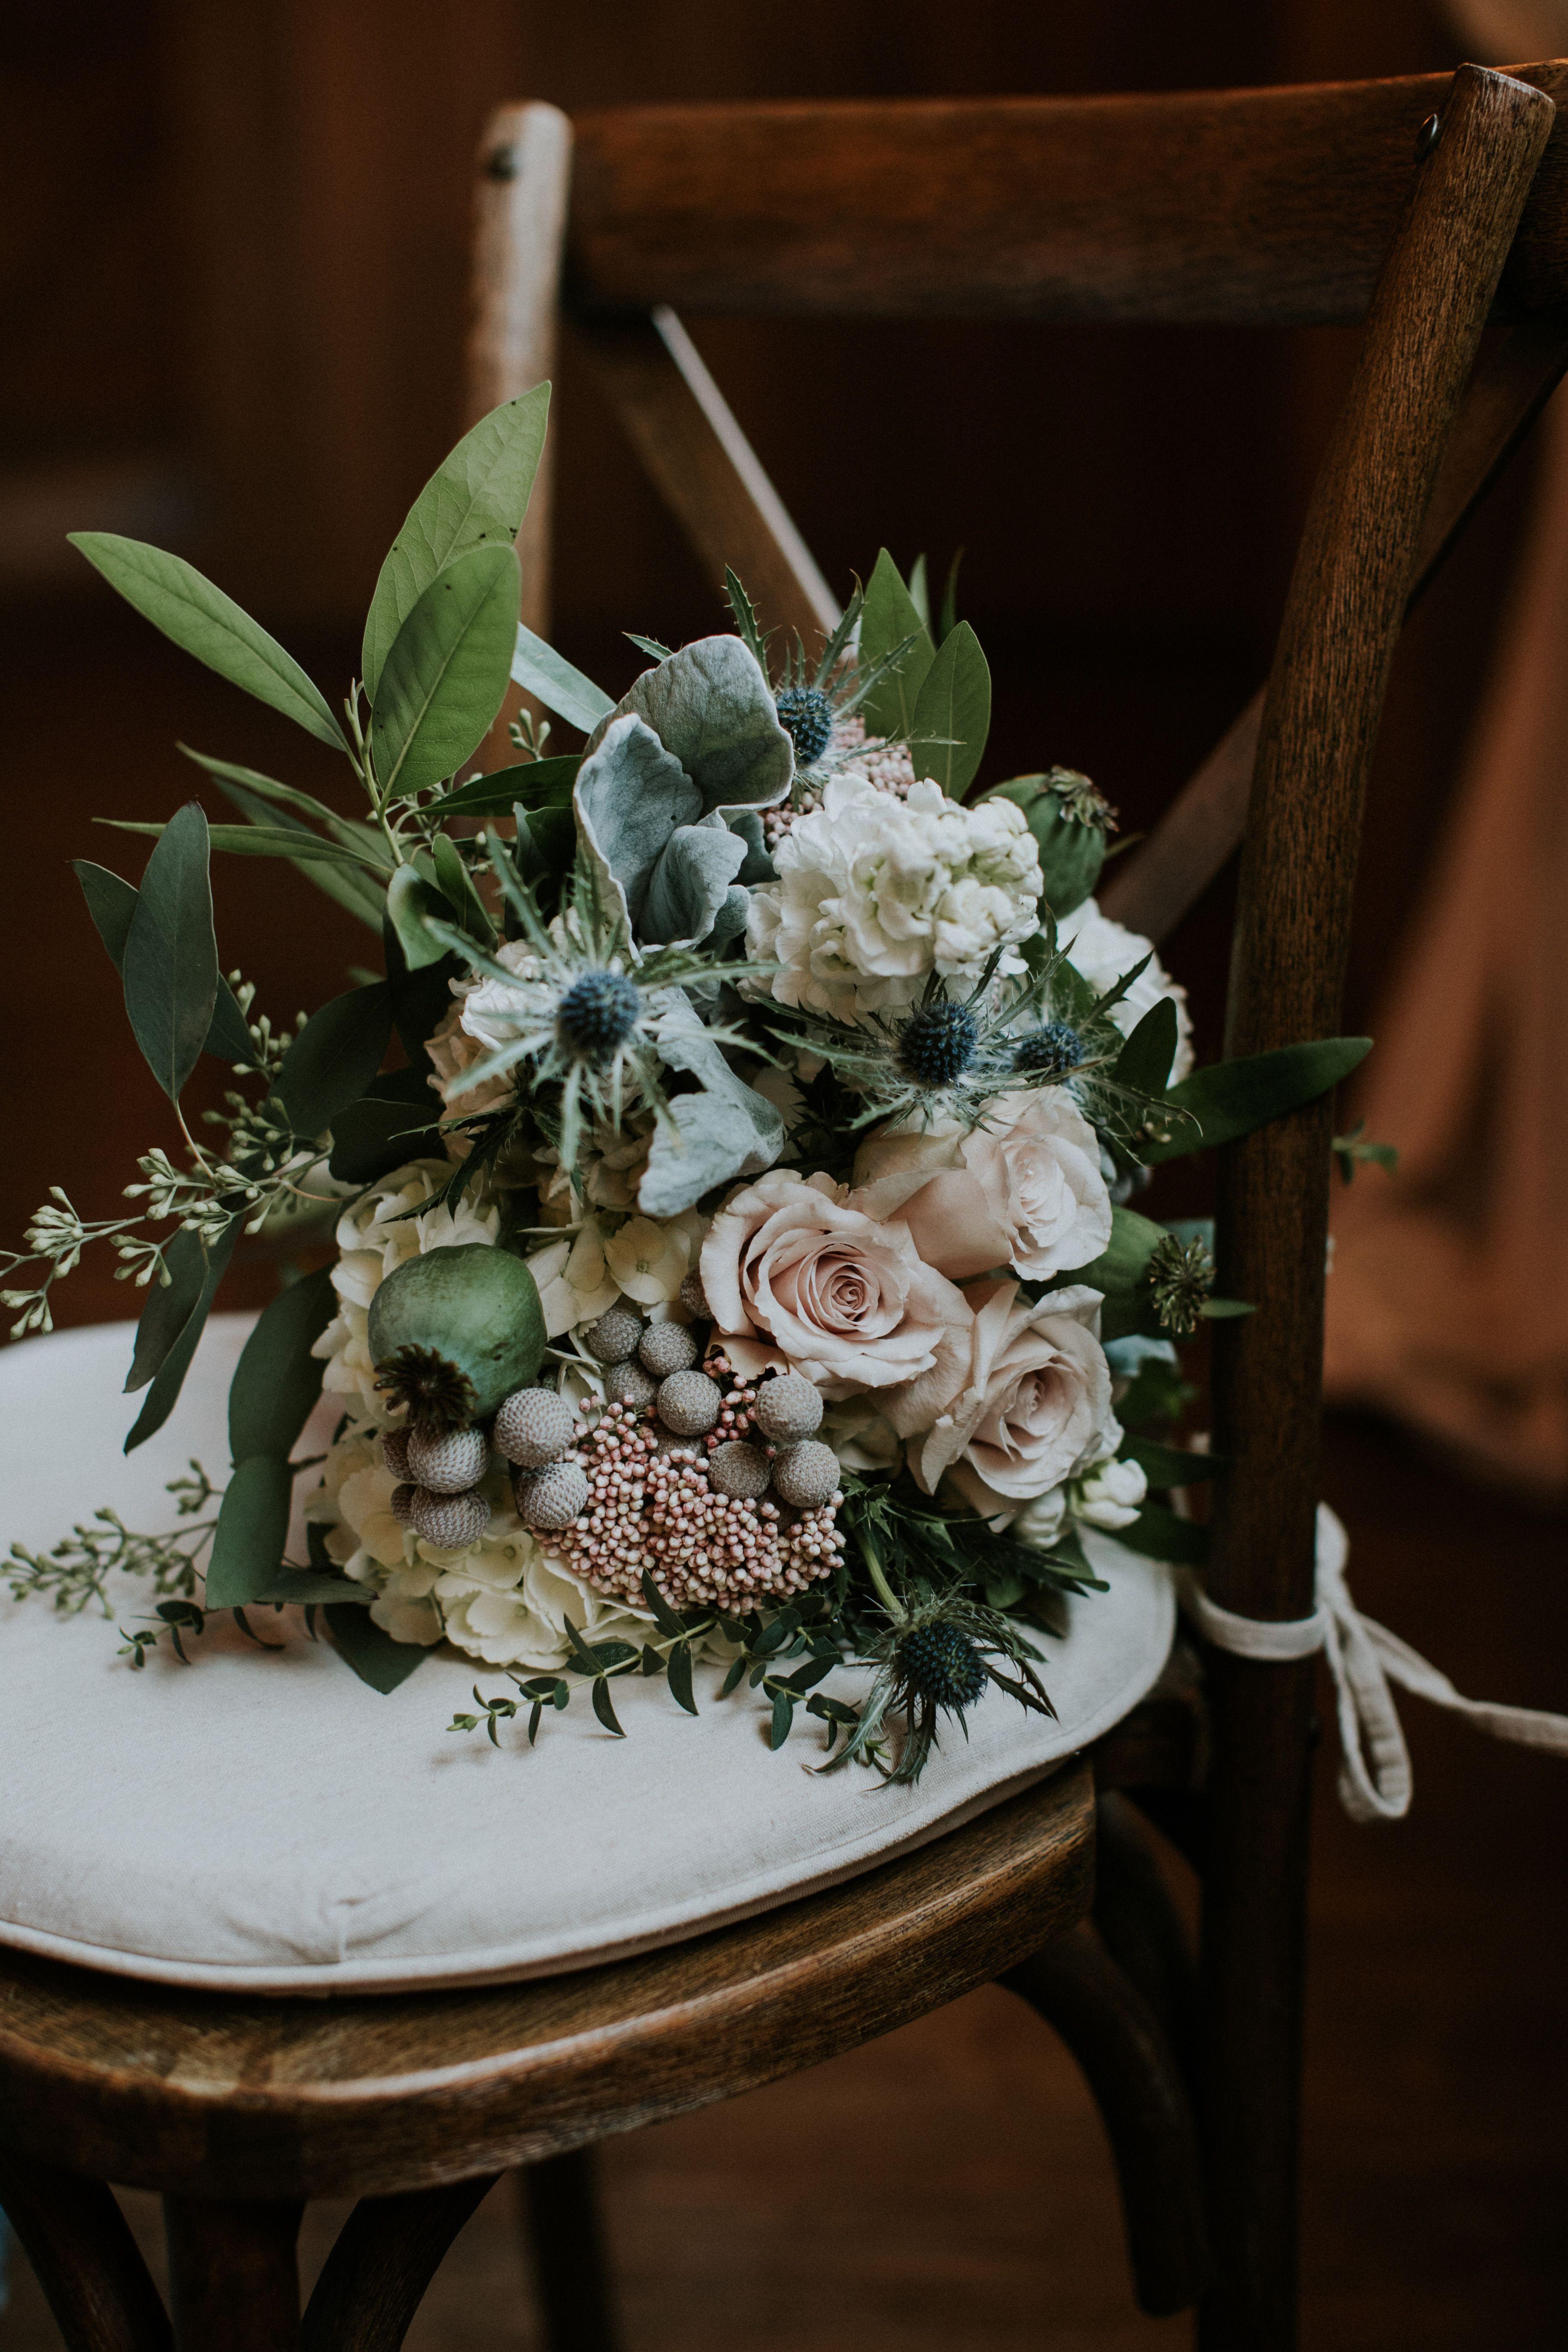 25 Stunning Rustic Wedding Ideas Decorations For A Rustic Wedding